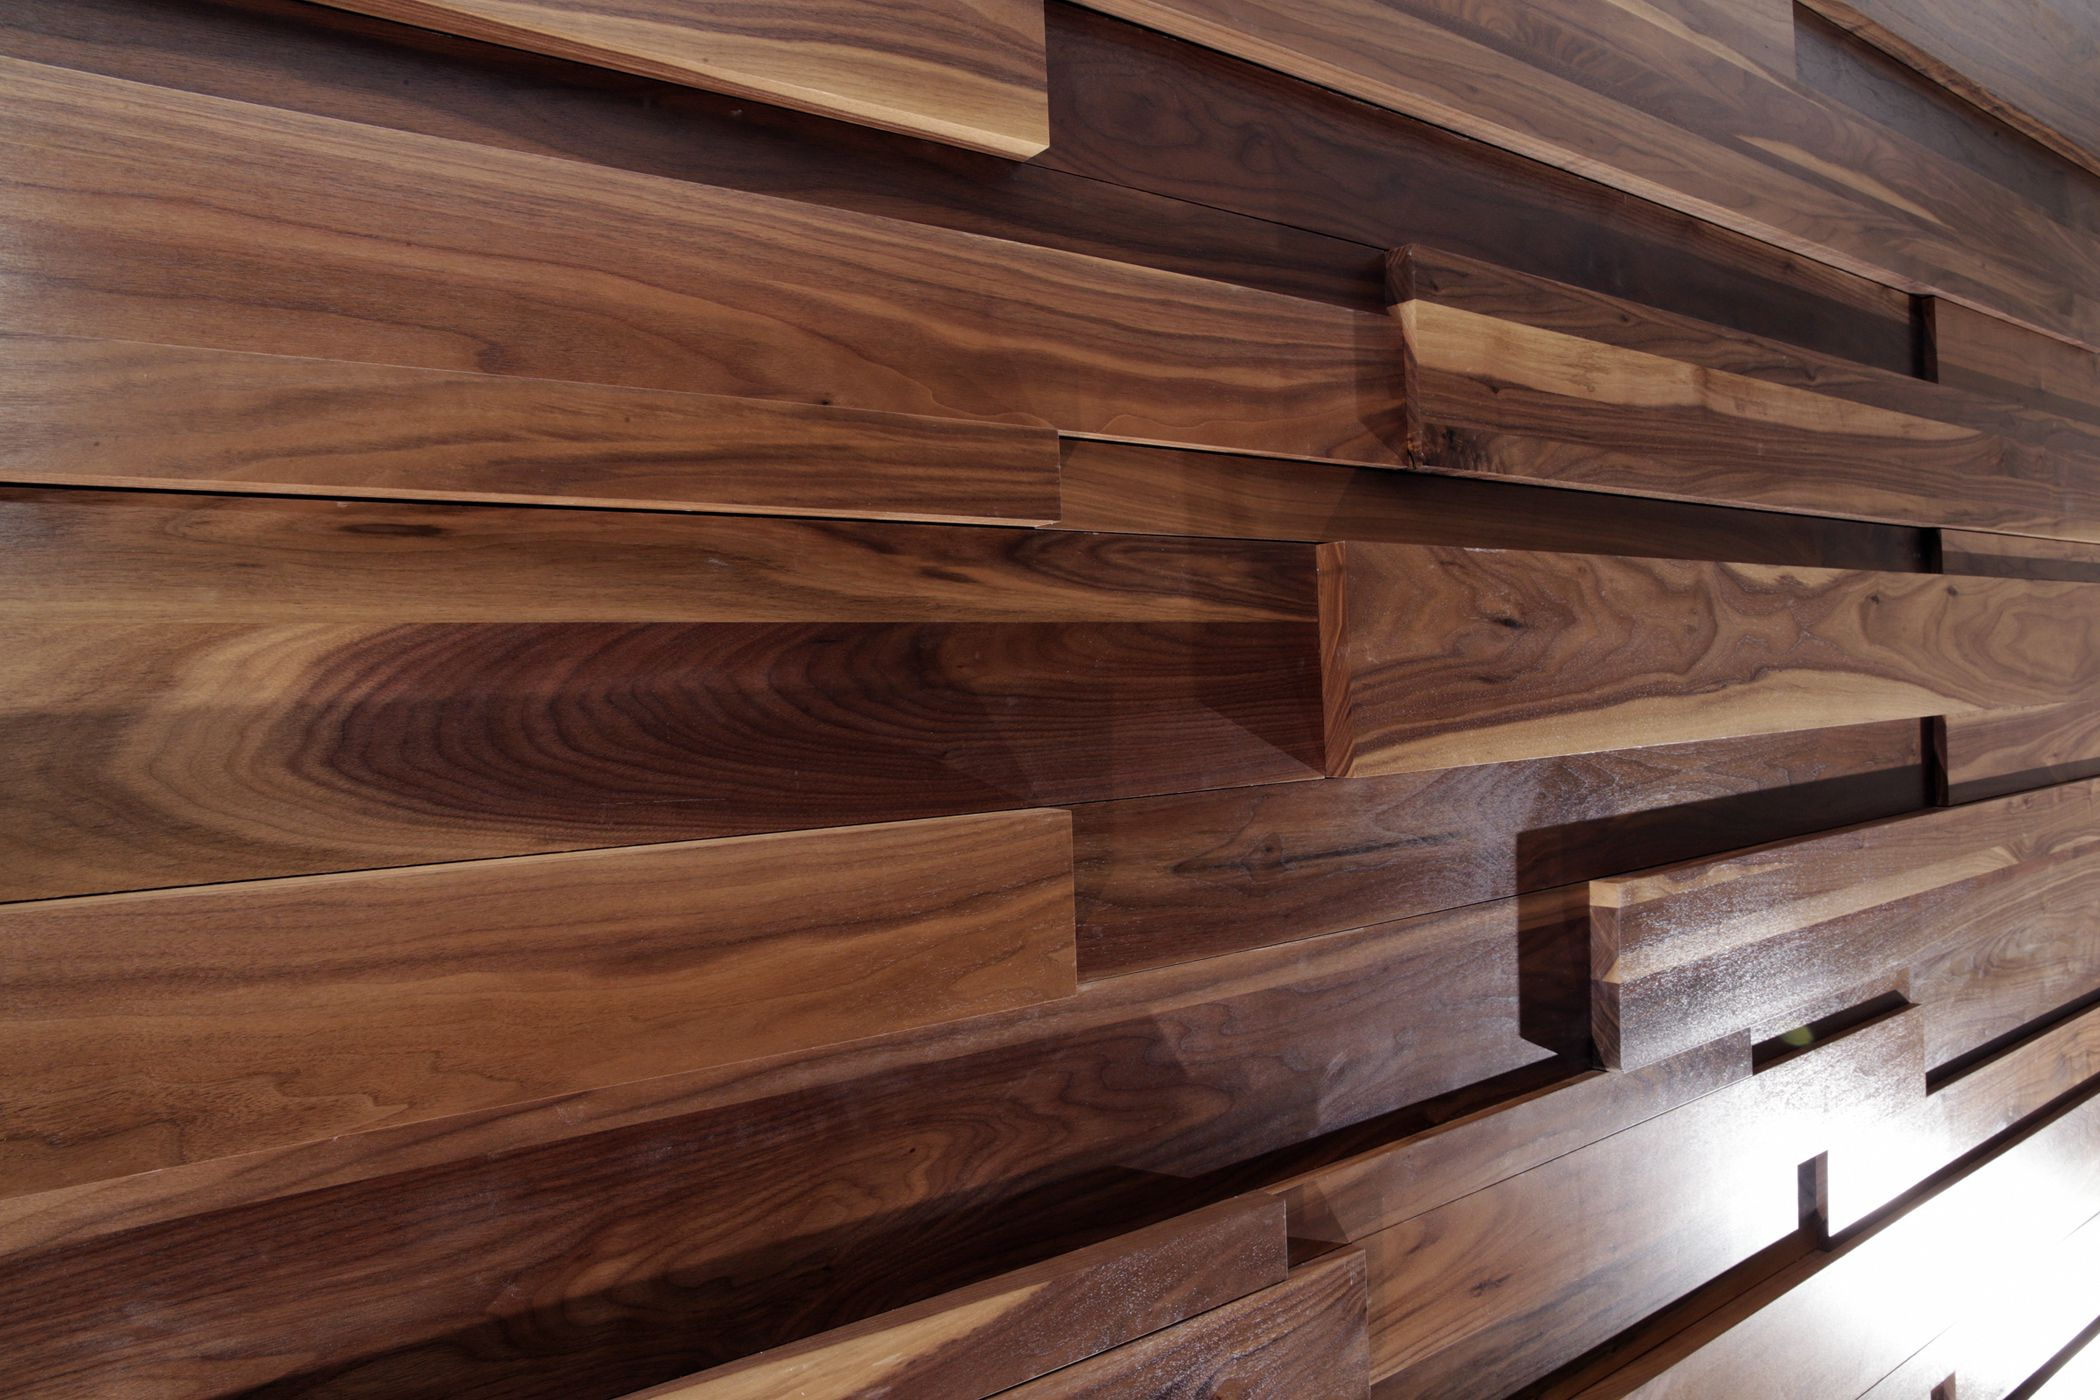 3d Wood Wall Panels Ottawa Classic Stairs Wood Panel Walls Wooden Wall Panels Wooden Panelling